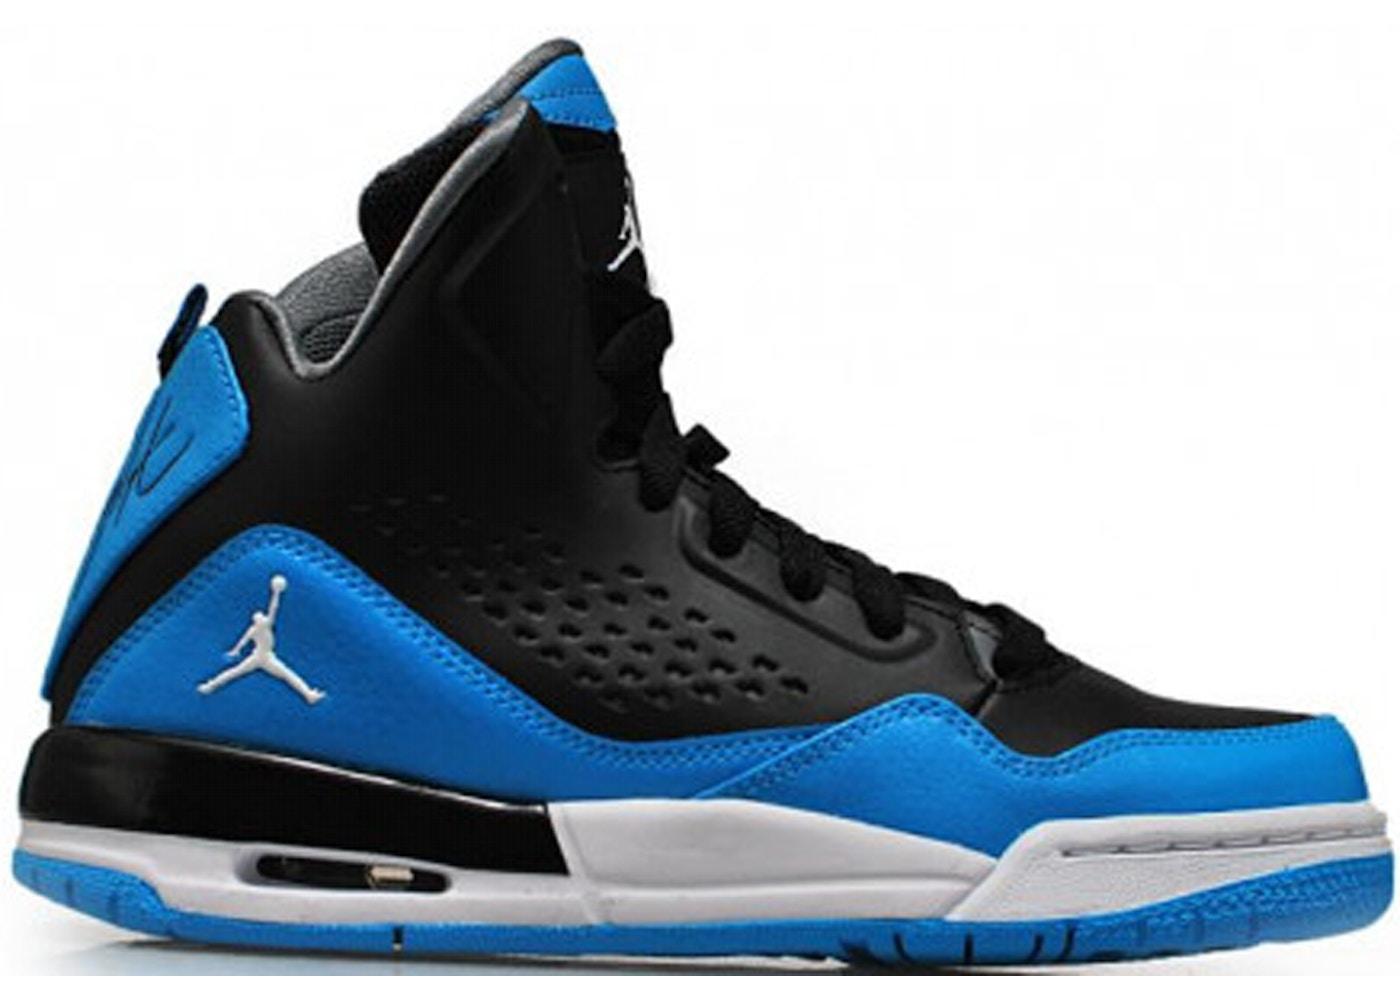 Jordan SC 3 Black Dark Powder Blue (GS)